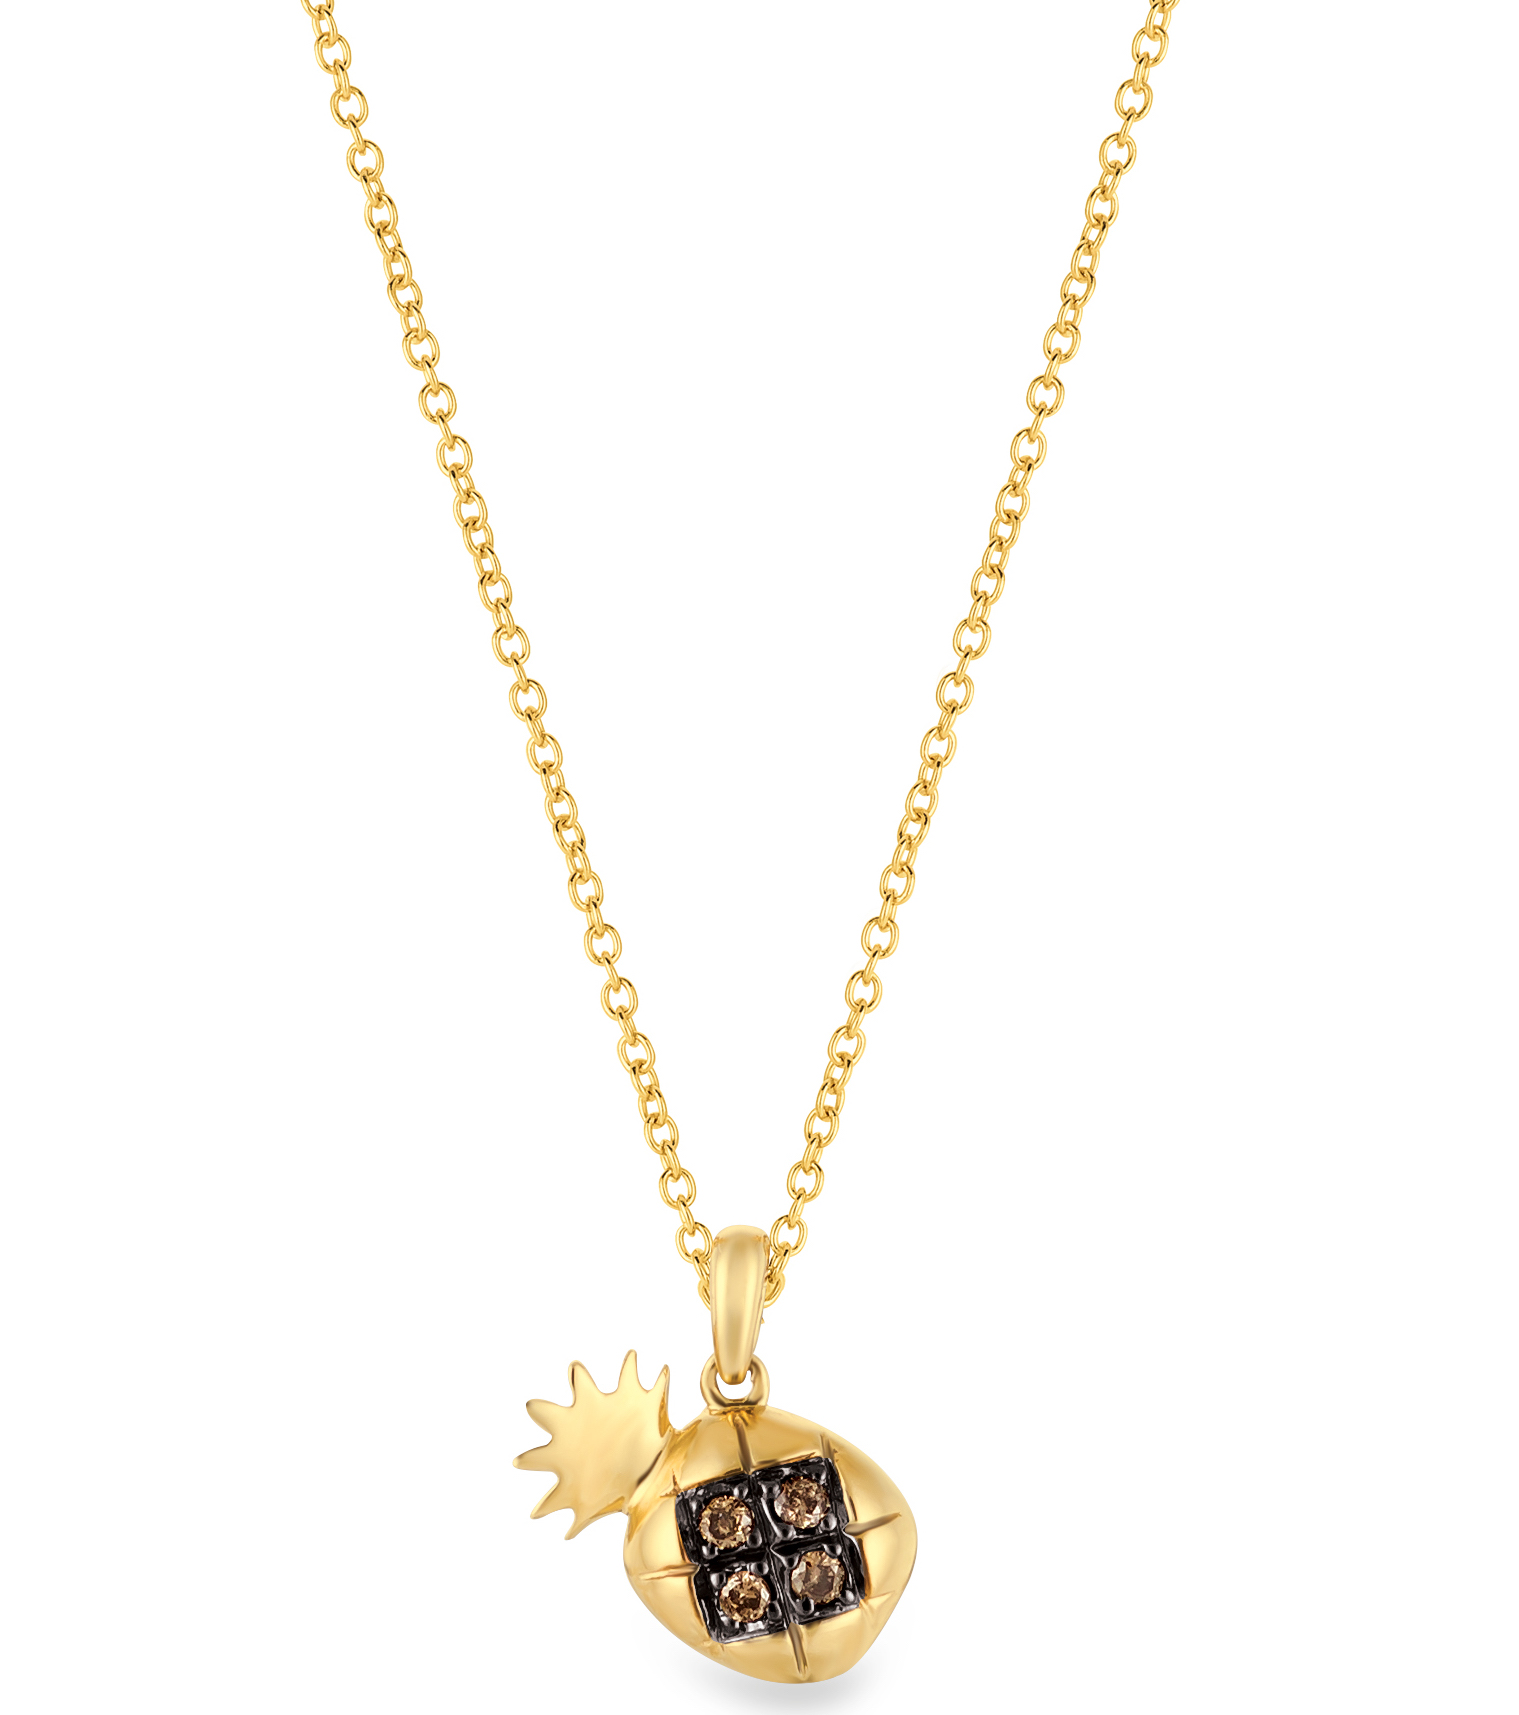 Le Vian pineapple pendant